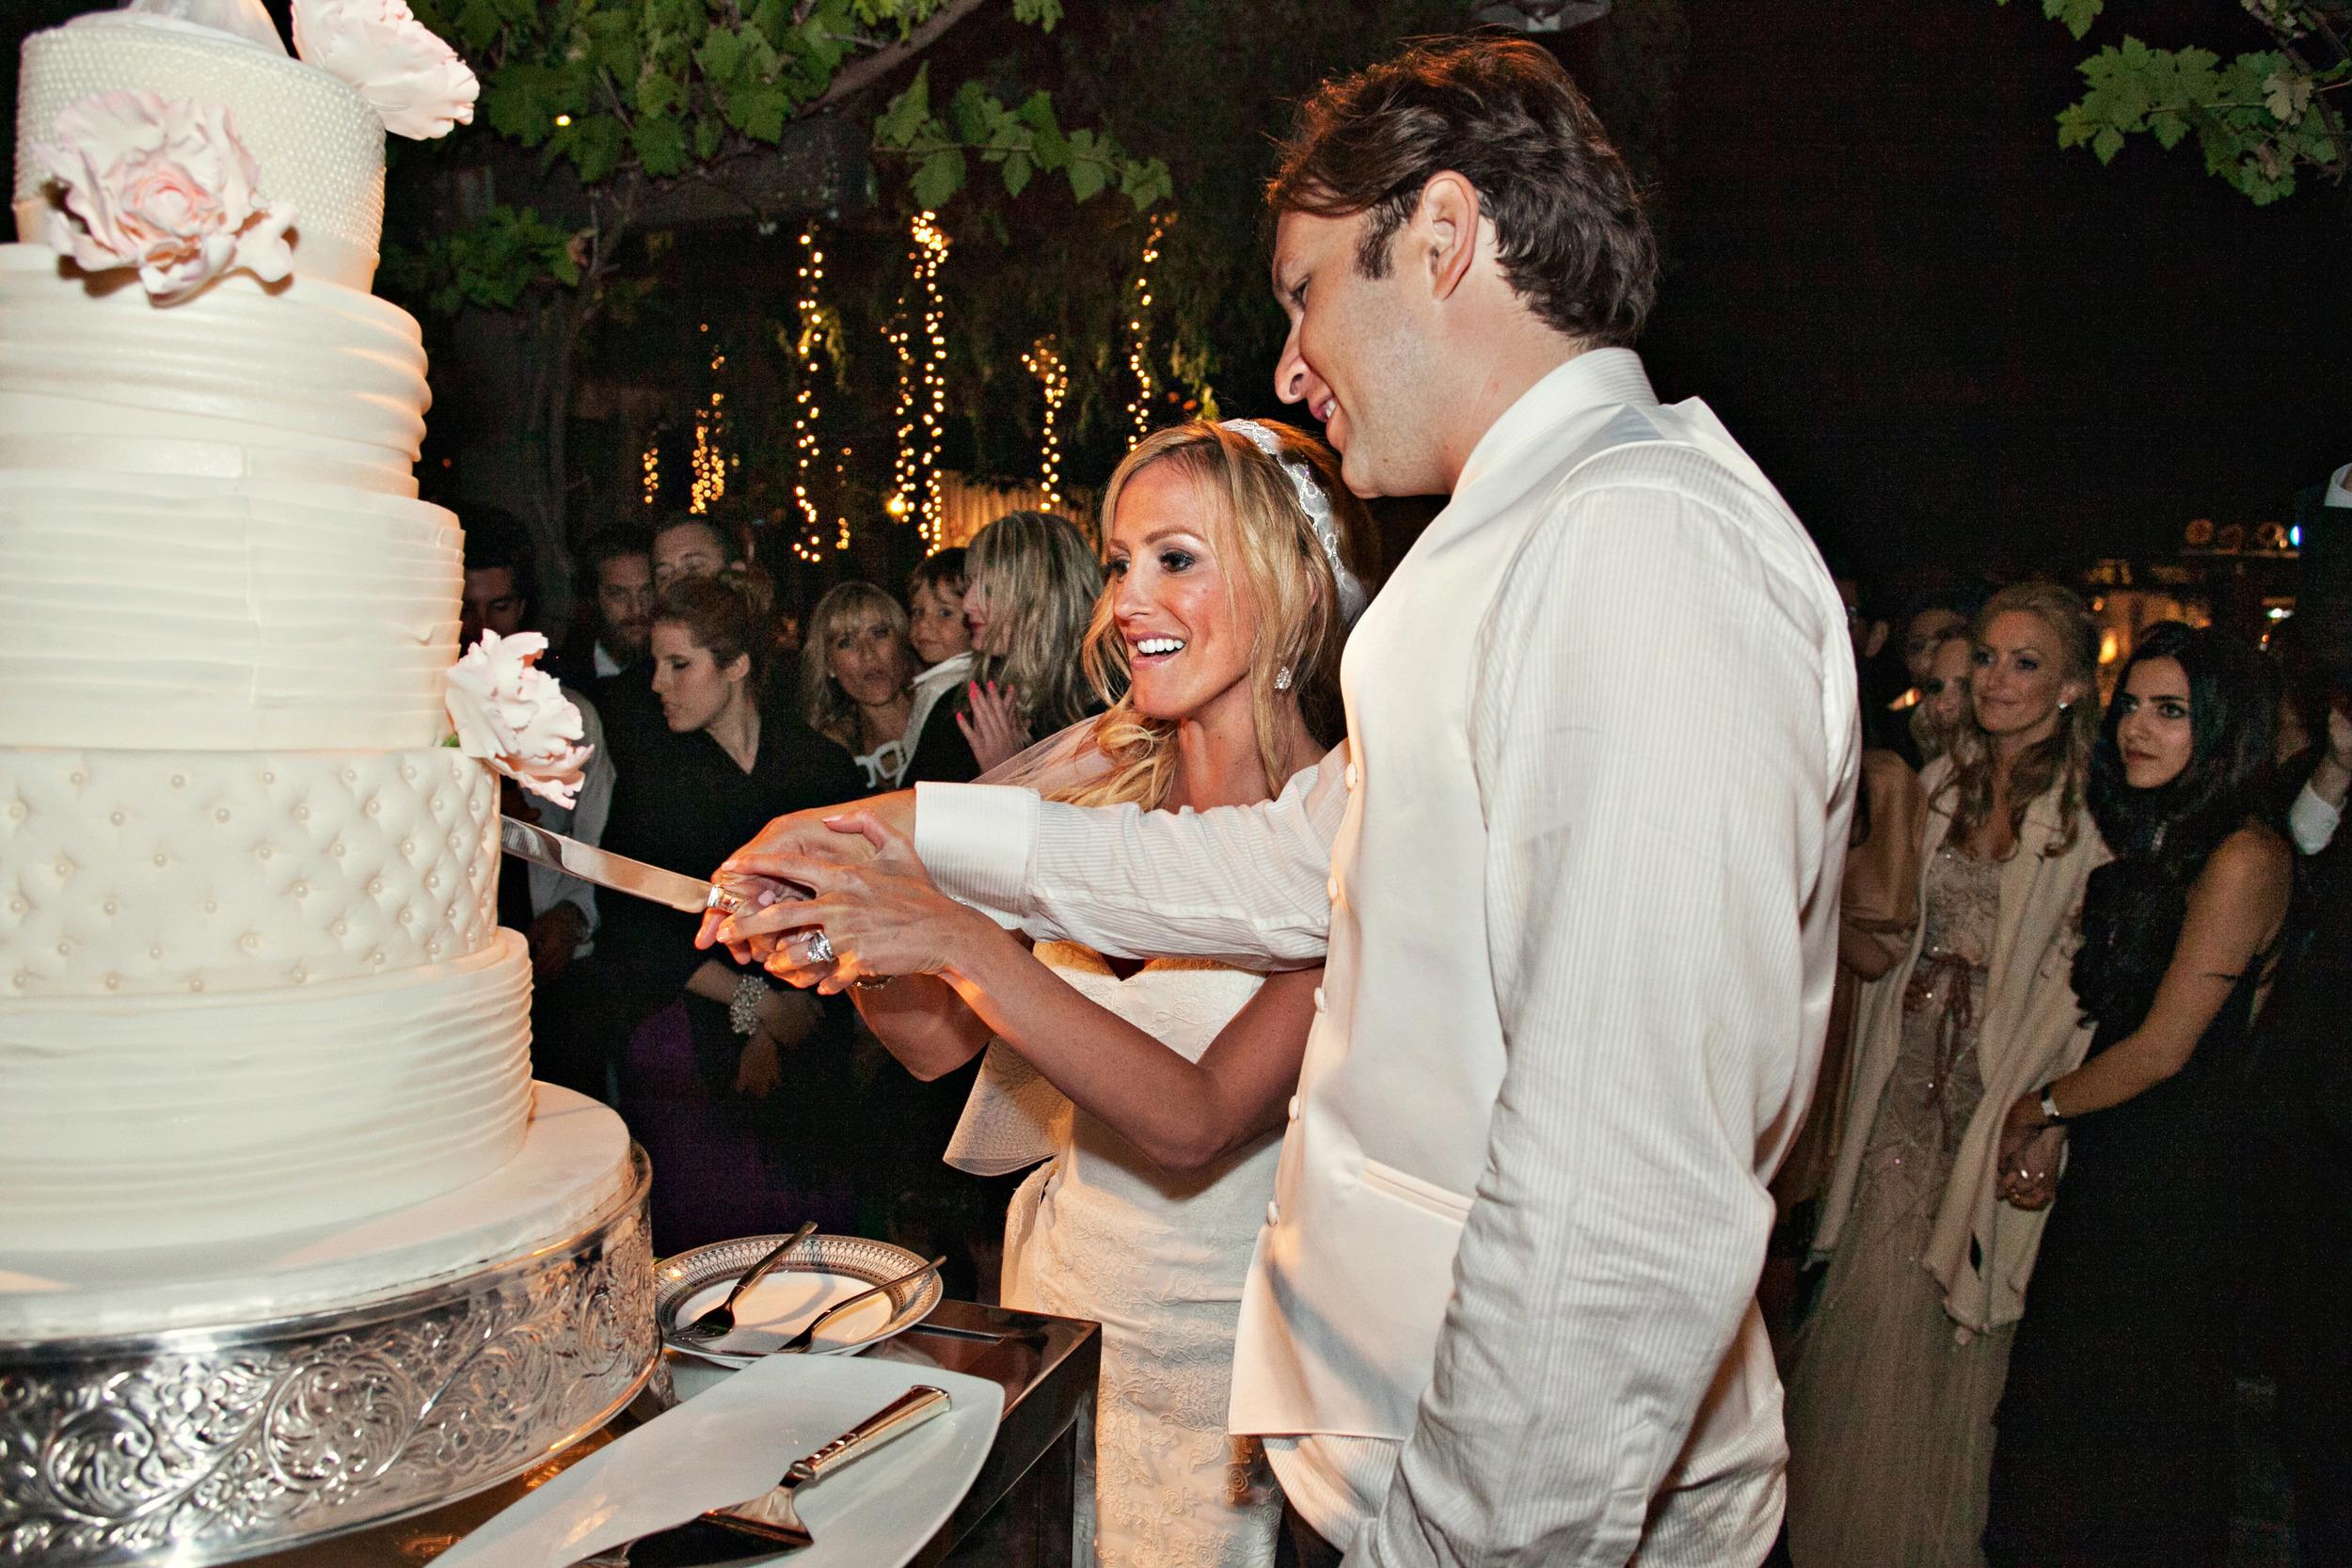 57. modern+romantic wedding cake,  white+ruffle + tufted+pearl+ rouching wedding cake, hanging fairy lights, sparkle wedding, summer wedding ideas .jpg